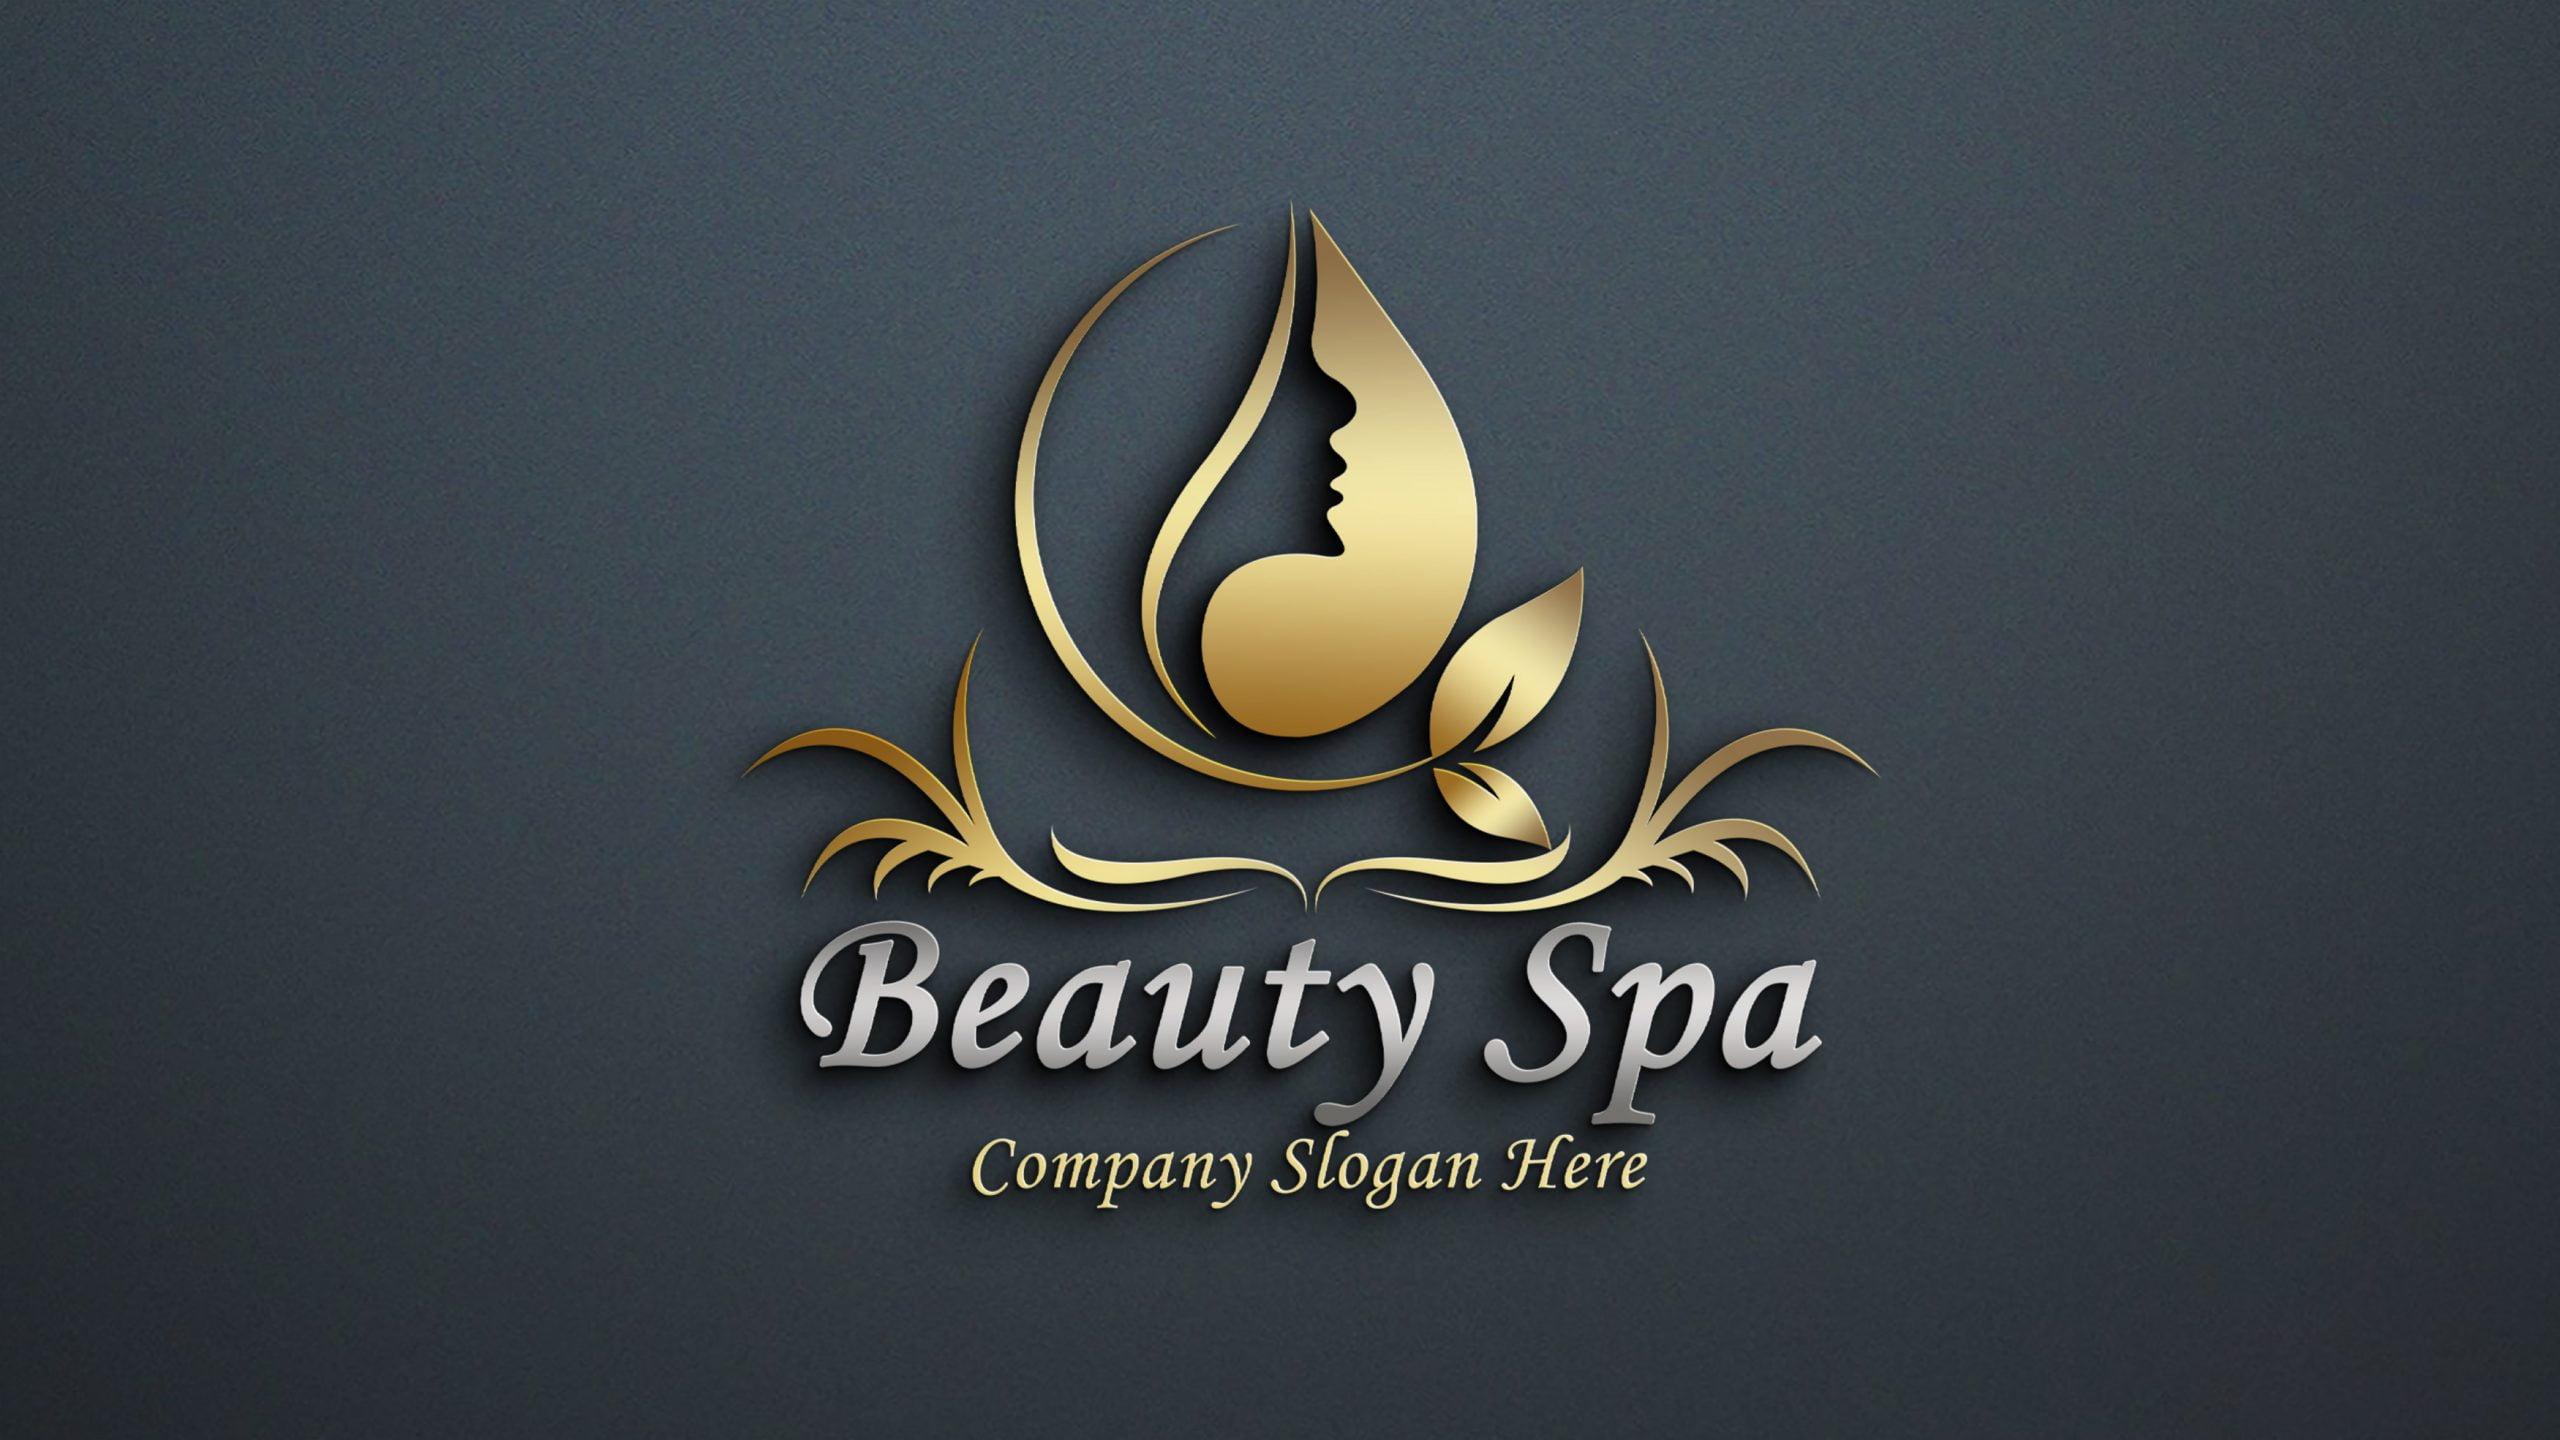 Free Beauty&Spa Logo Design PSD Download